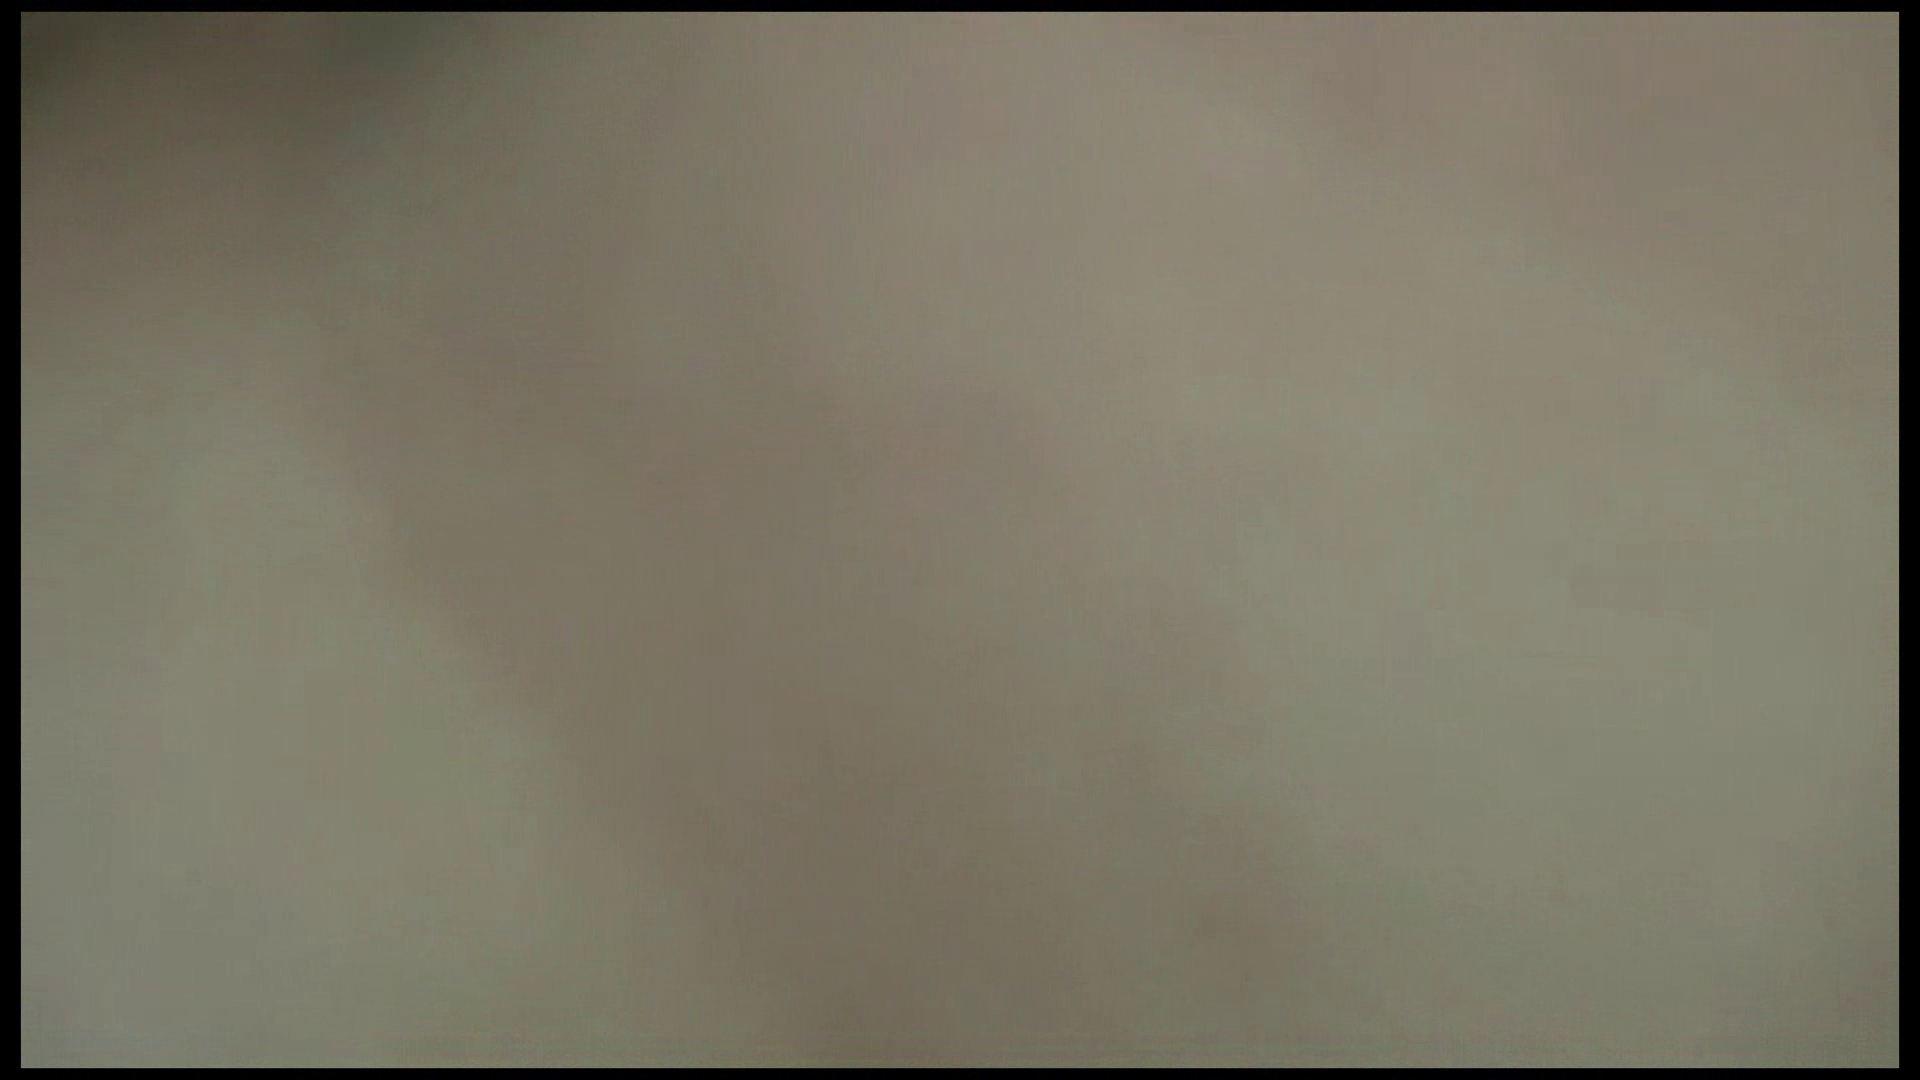 ハメ撮り天国 Vol.12 前編 OL裸体 | 流出作品  77画像 68